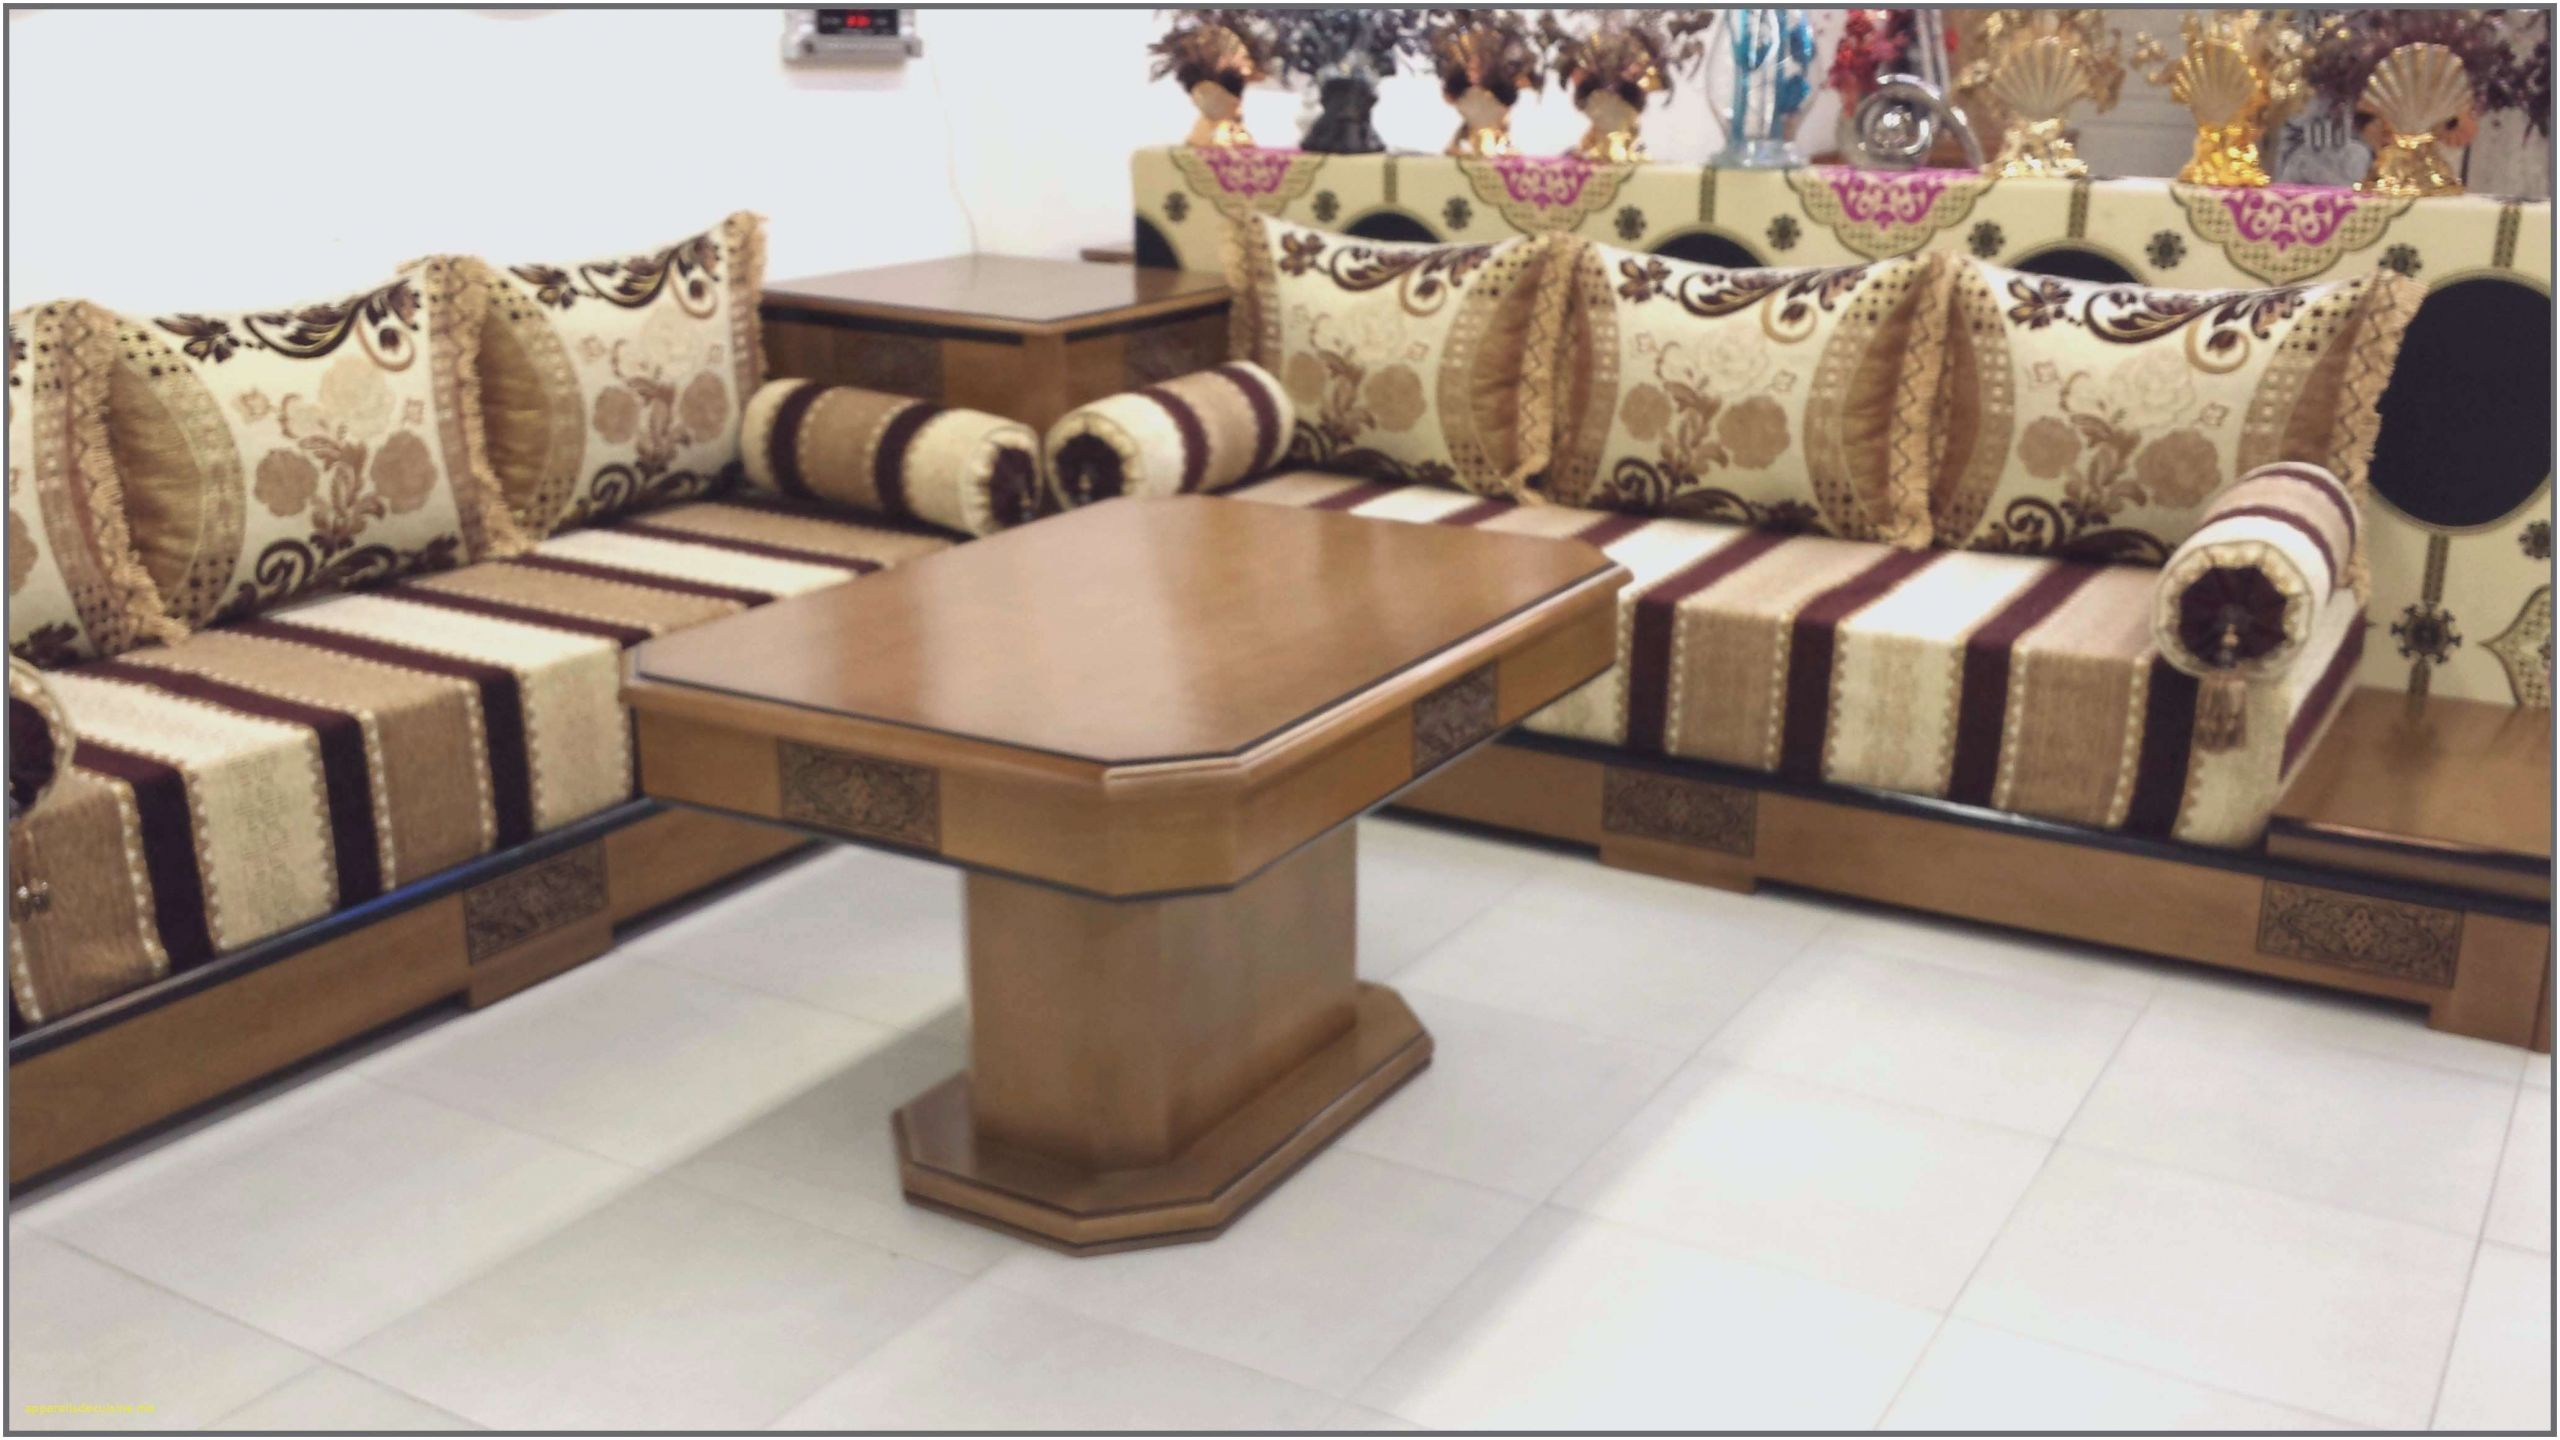 leboncoin mobilier bon coin meuble salon beautiful le bon coin 13 ameublement marseille beau meubles marseille 0d unique bon coin meuble salon beautiful le bon coin 13 ameublement marseille